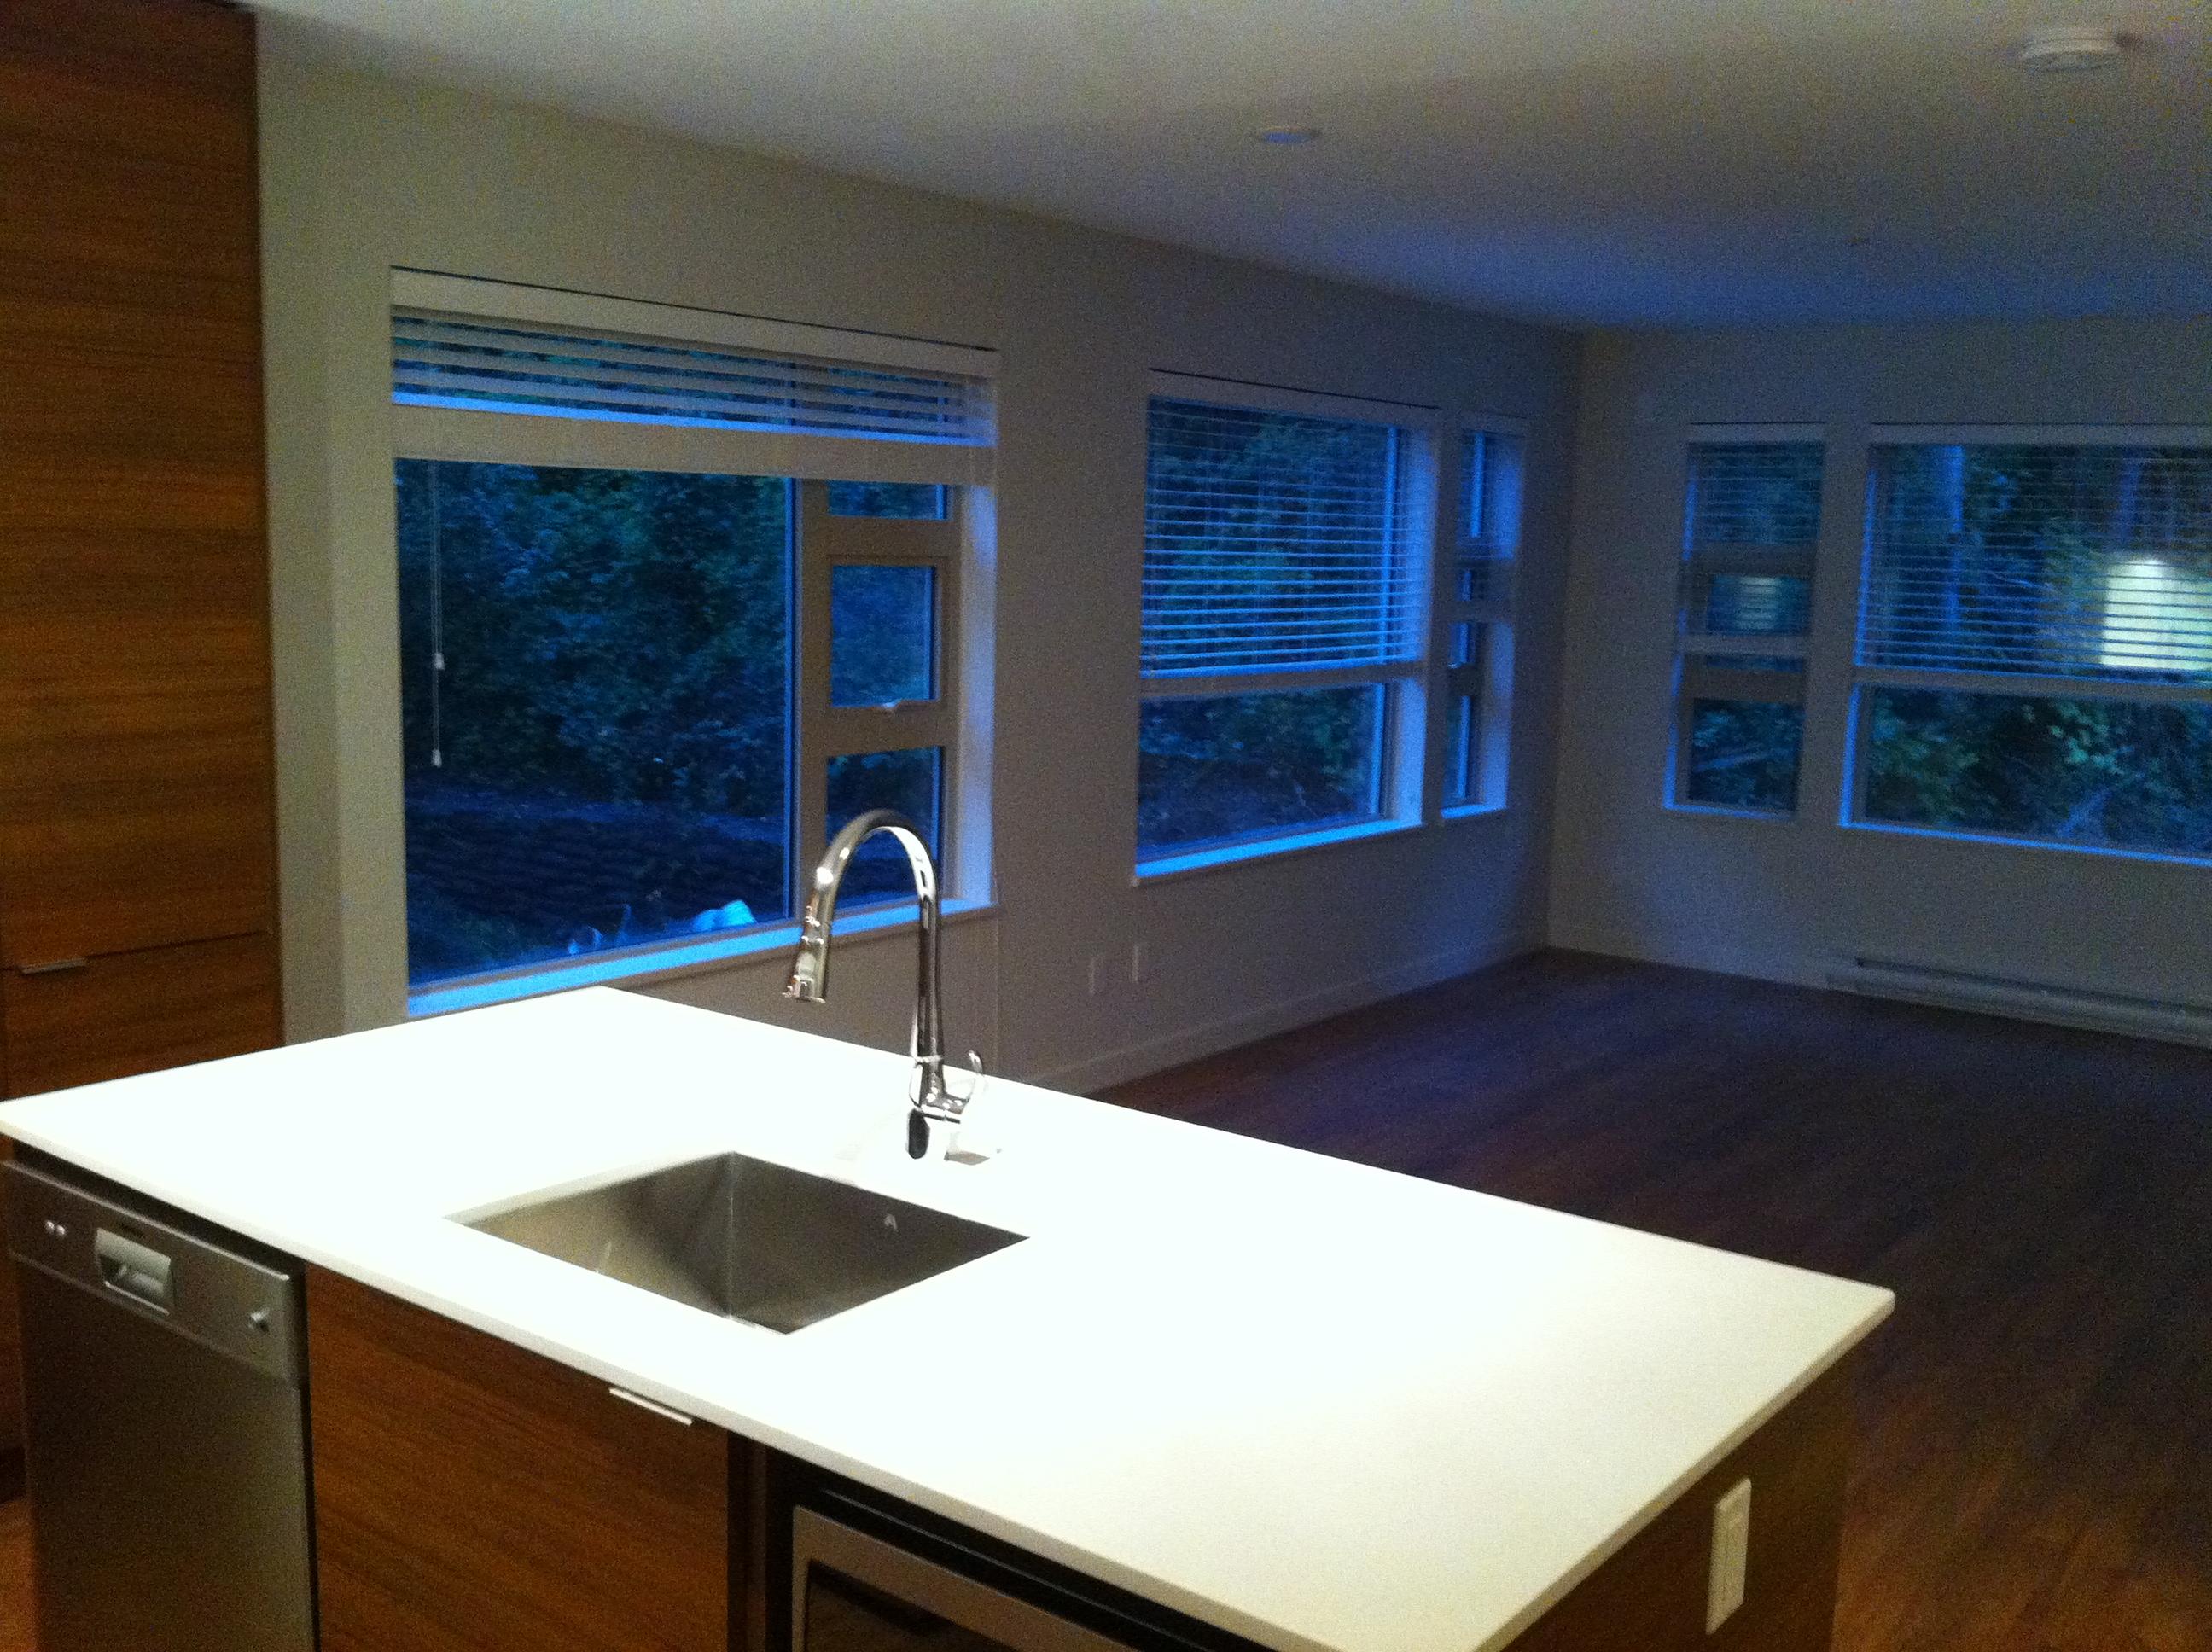 Pemberton Heights Condo for sale:  1 bedroom  Stainless Steel Appliances, Granite Countertop, Tile Backsplash, Glass Shower, Laminate Floors 690 sq.ft. (Listed 2011-10-11)